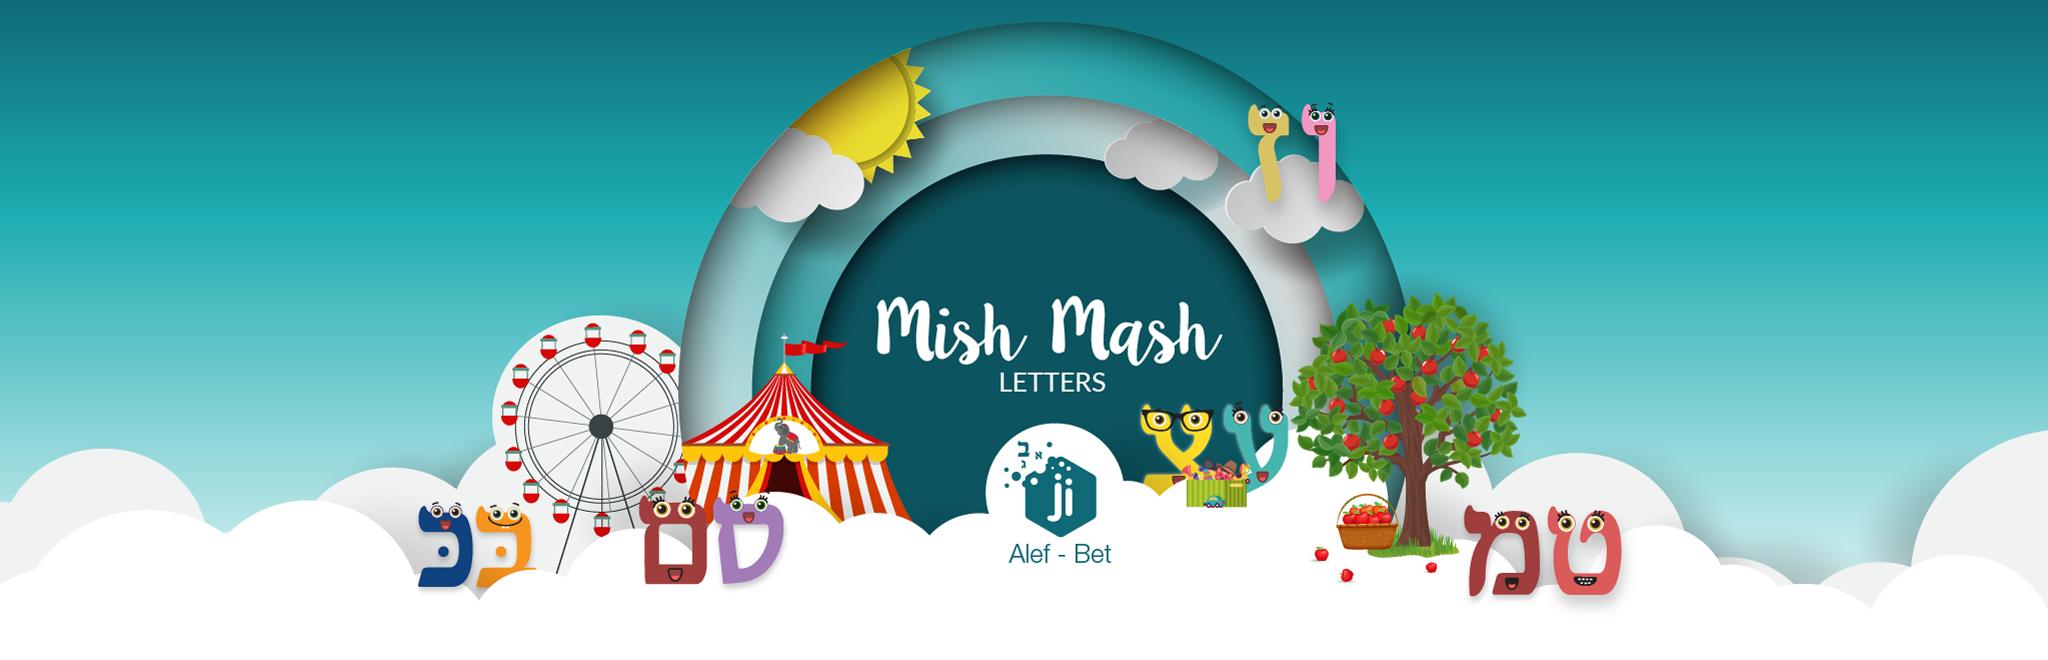 Mish_mash_banner